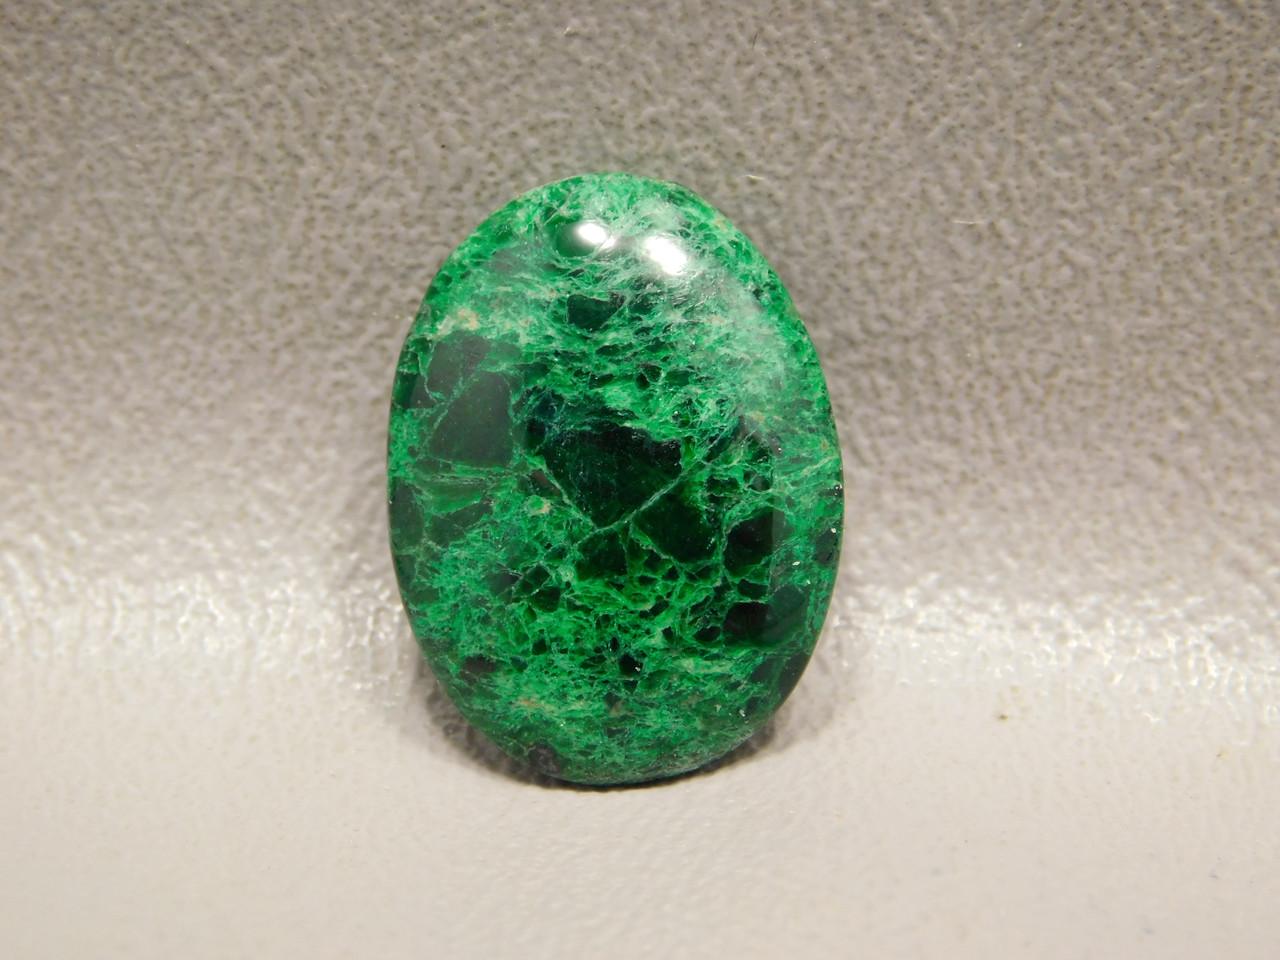 Maw Sit Sit Green Jade Loose Stone Cabochon #2